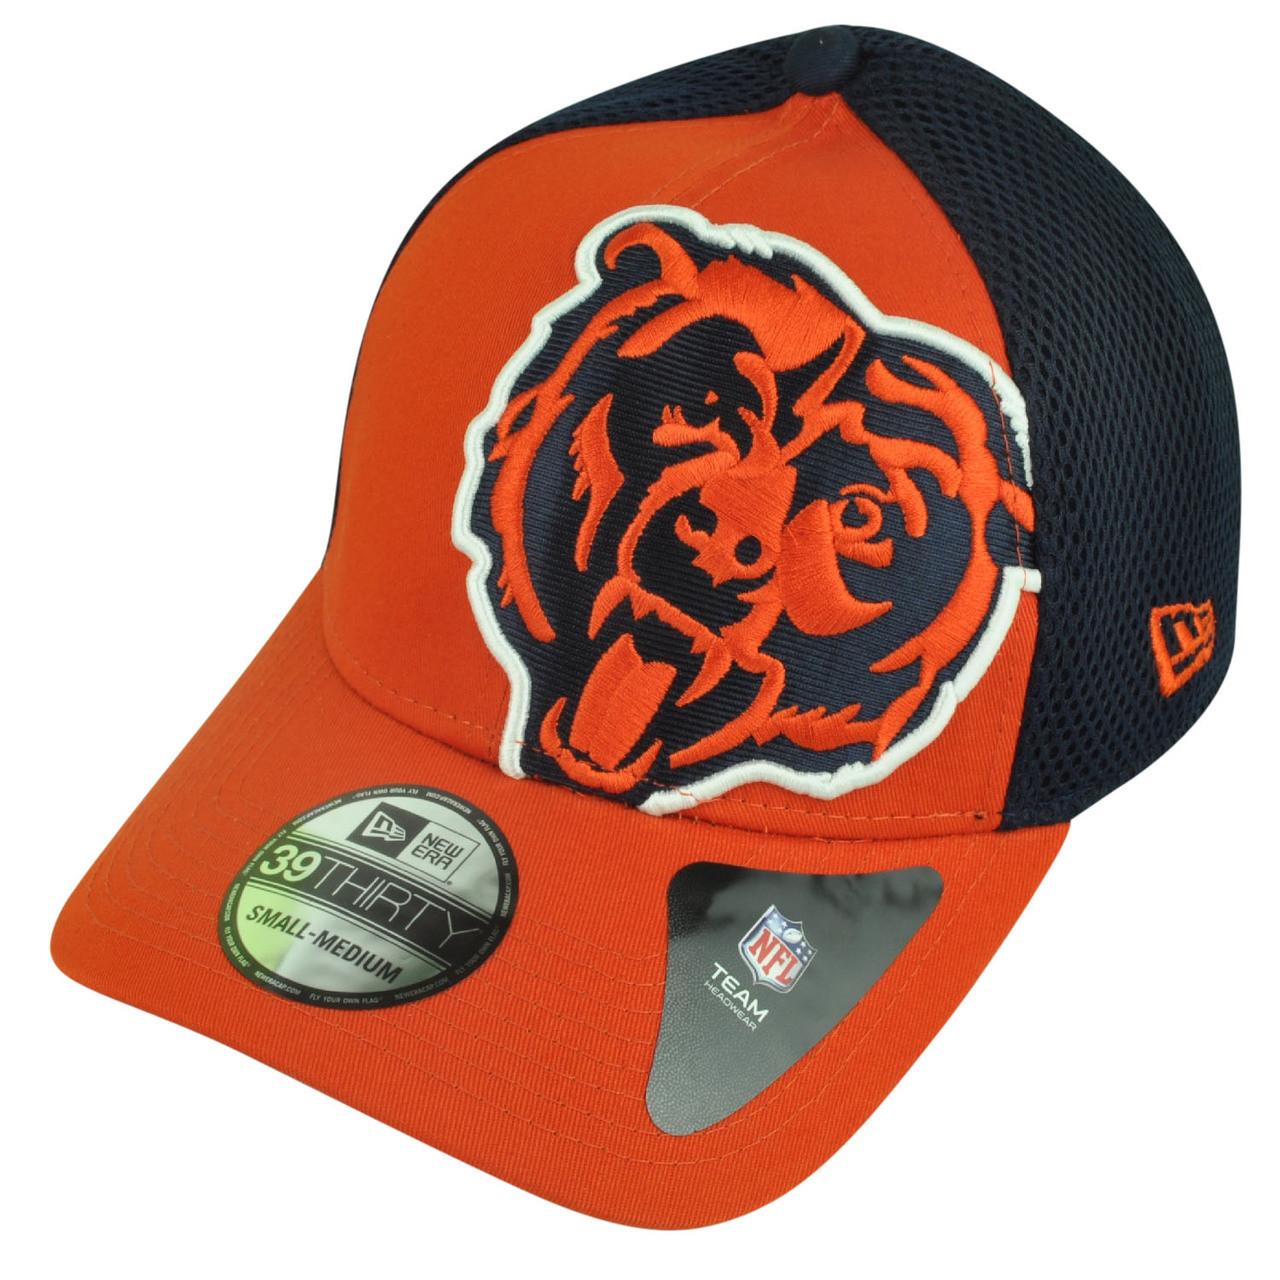 NFL New Era 3930 Chicago Bears Flex Fit Small Medium Logo Blimp Neo ... 091429621d43